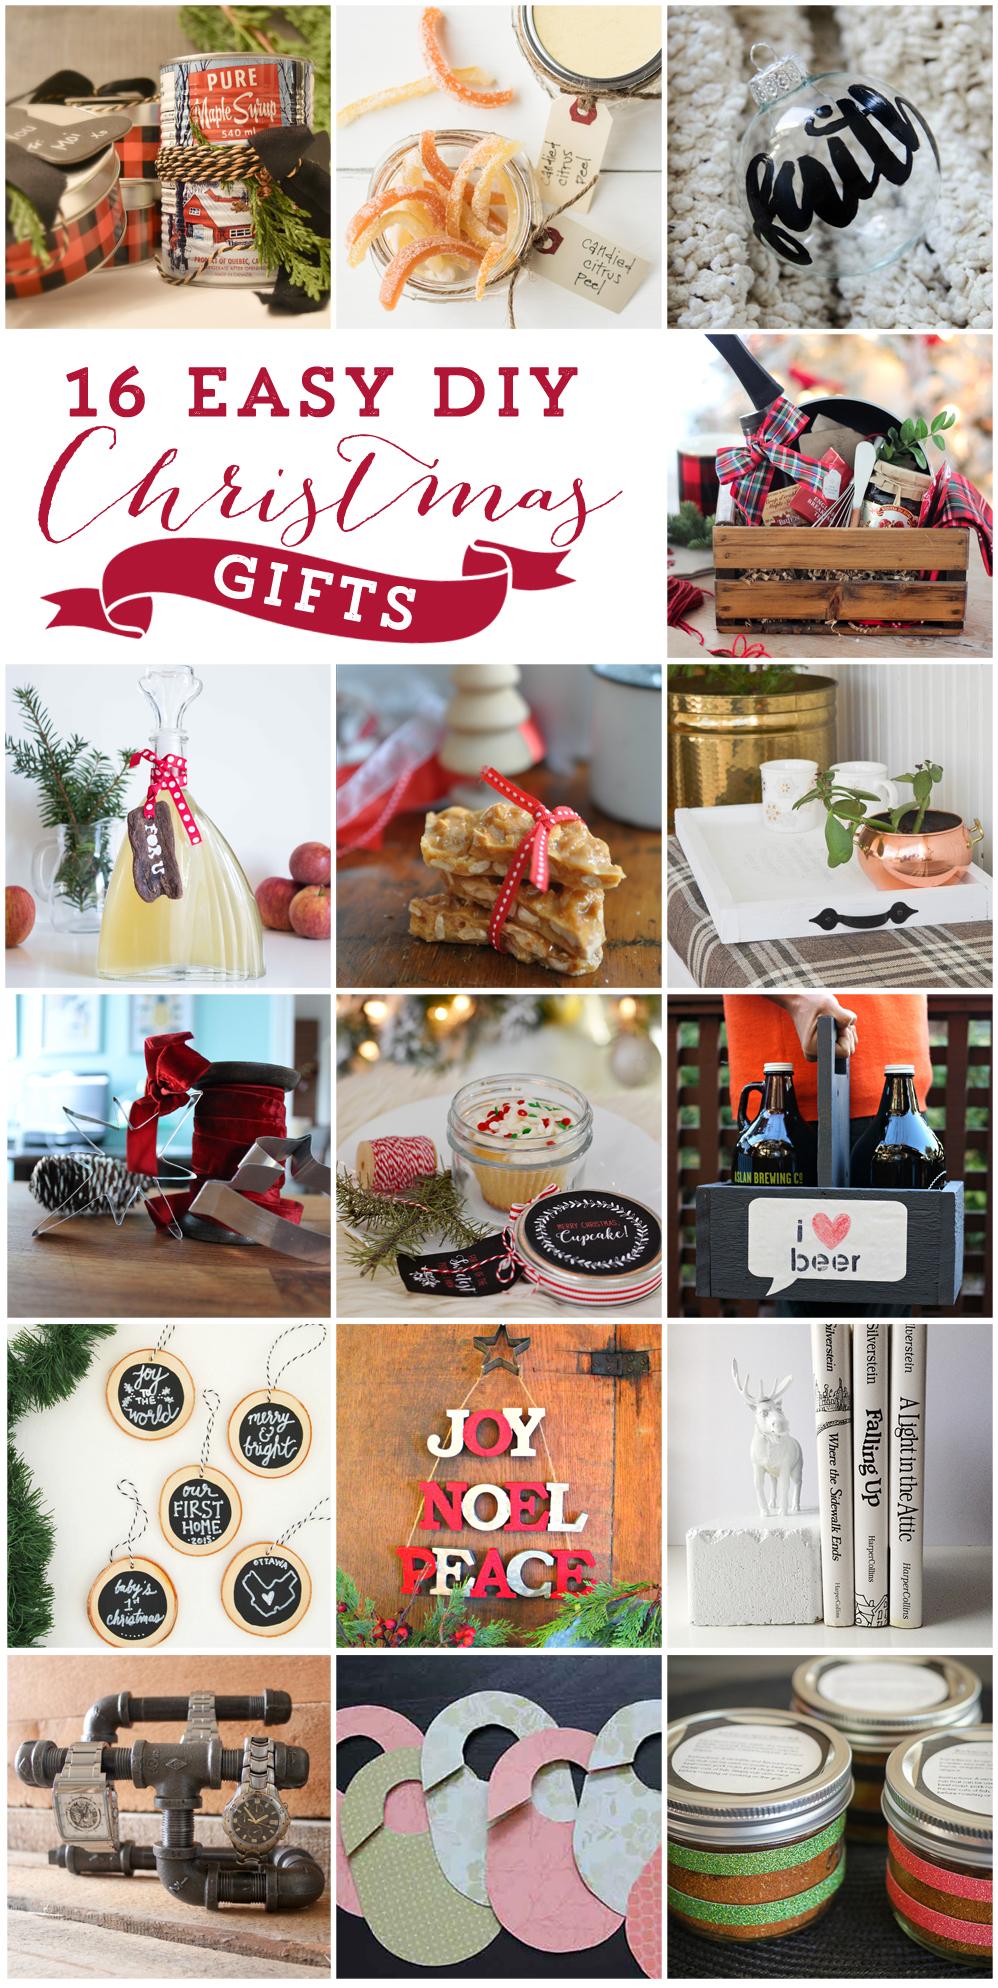 16 Easy & Beautiful DIY Christmas Gifts to Make